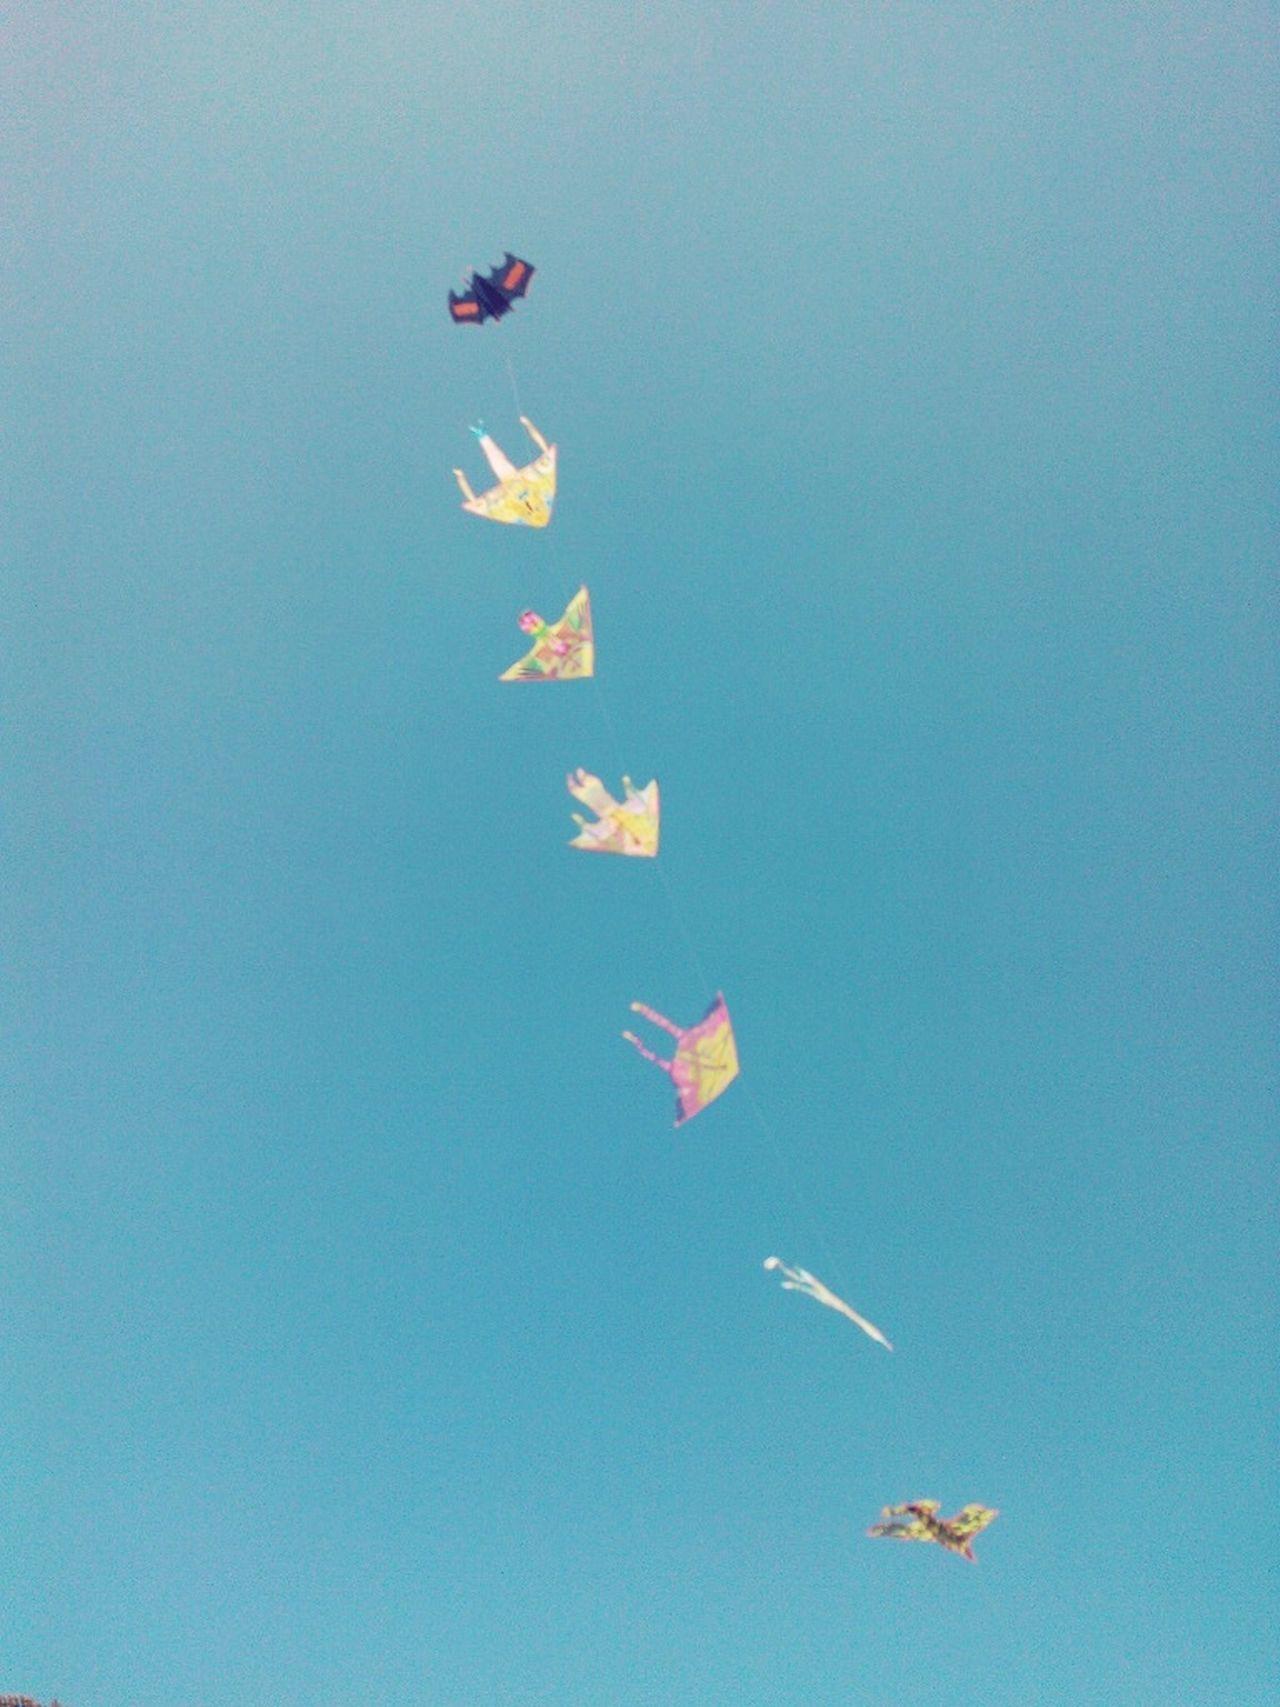 Flying A Kite Summer Enjoying Life Blue Sky